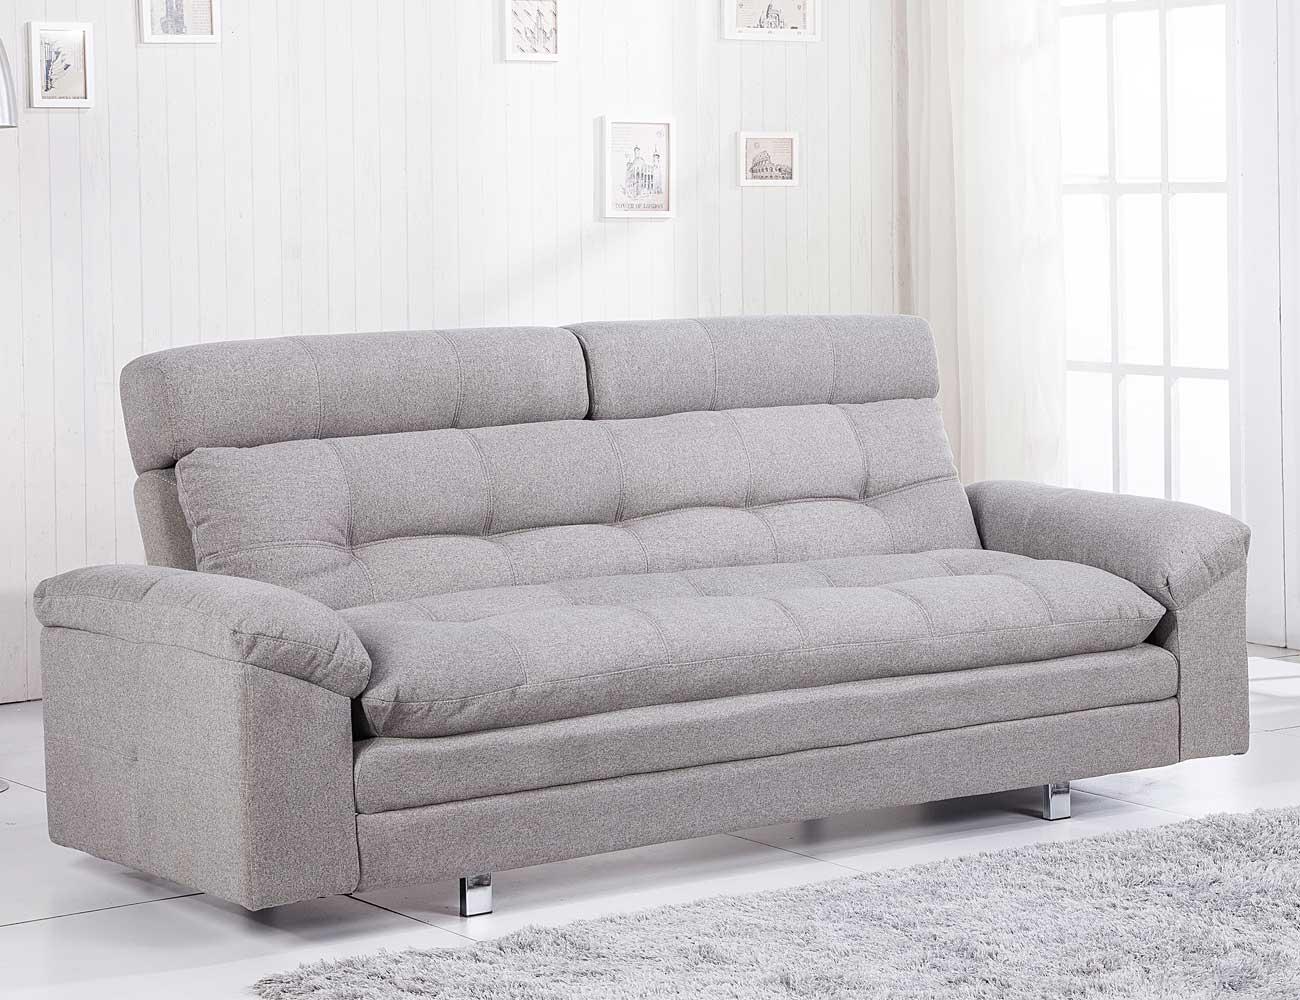 Sofa cama chaiselongue elegance ceniza